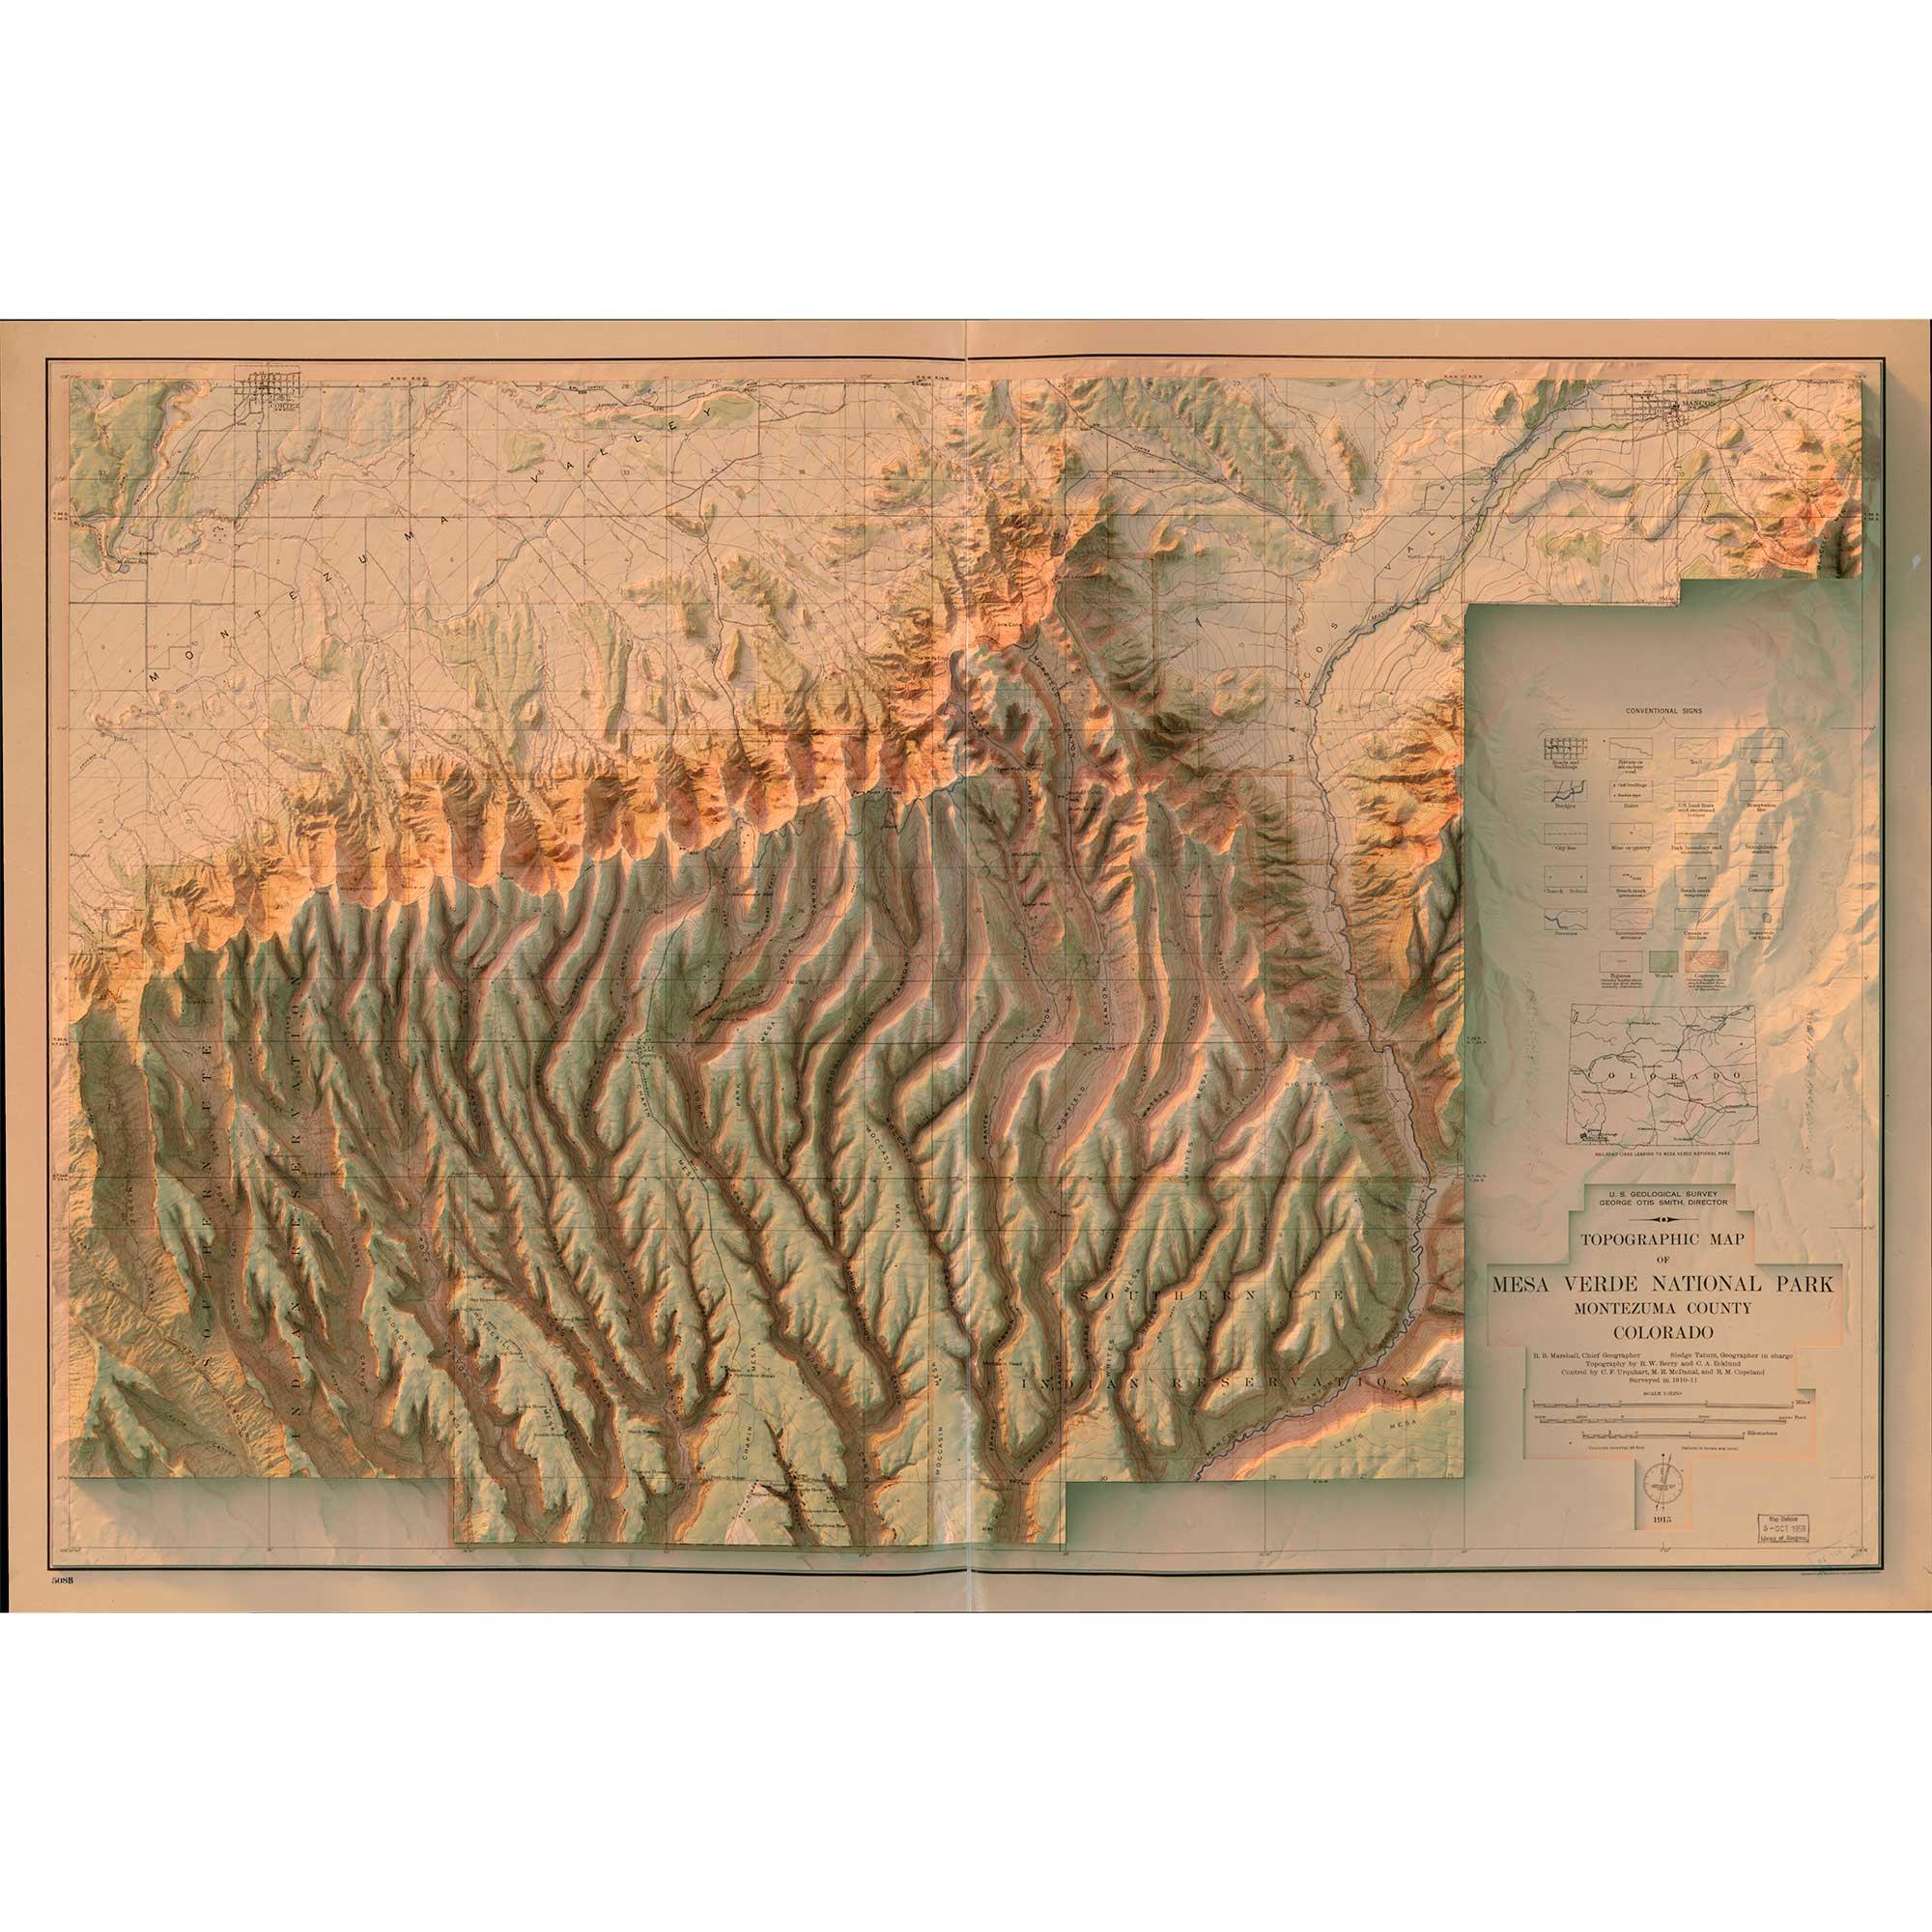 Mesa Verde National Park — Scott Reinhard Maps